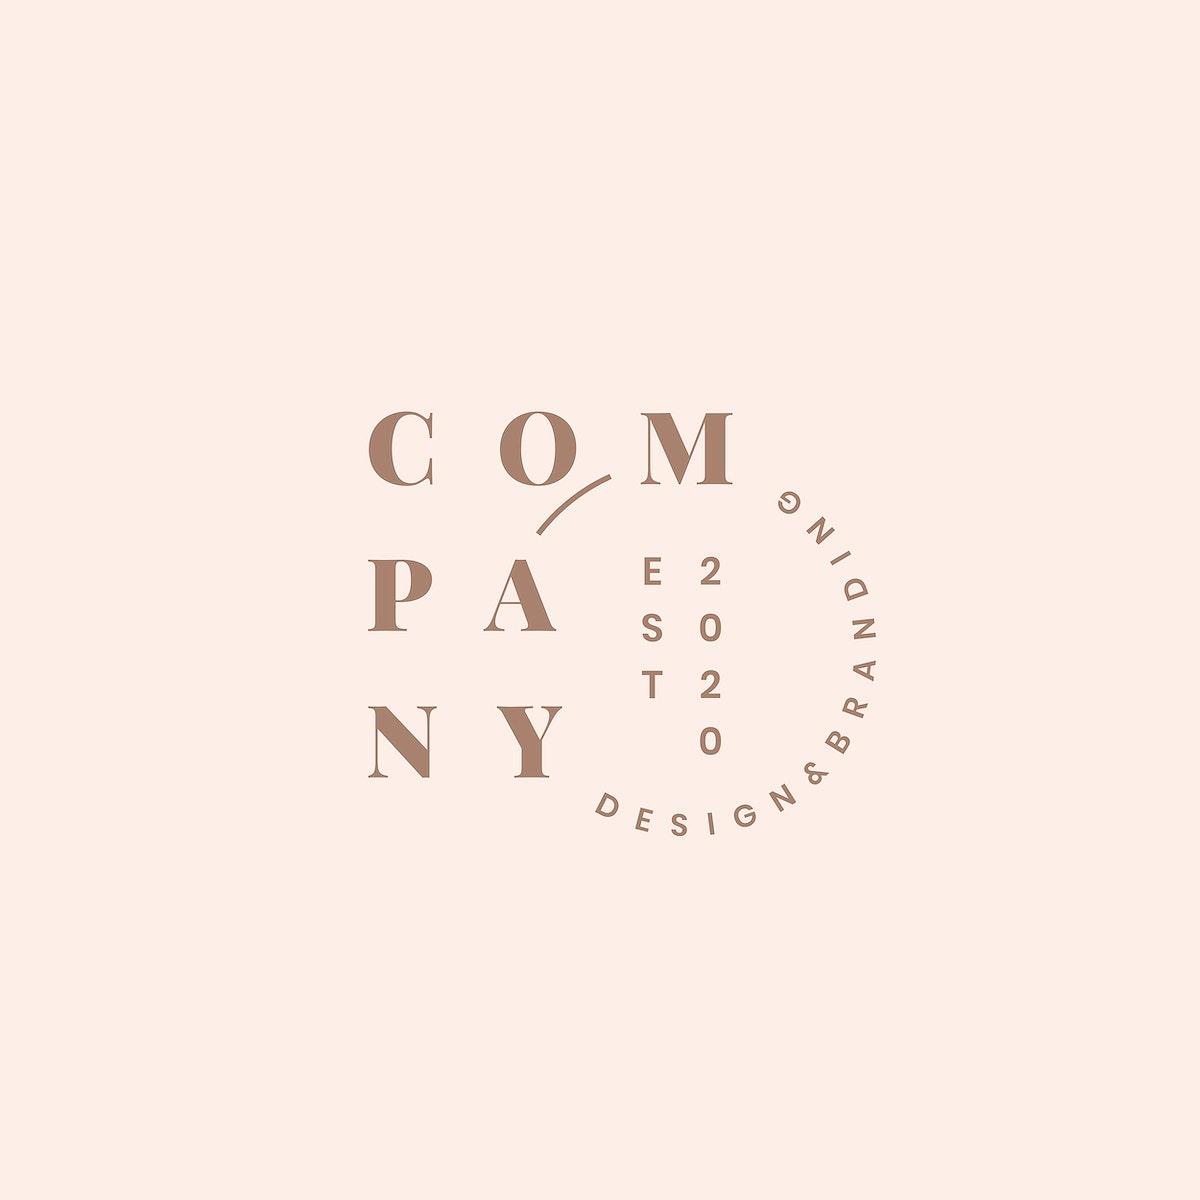 Company logo and branding design vector